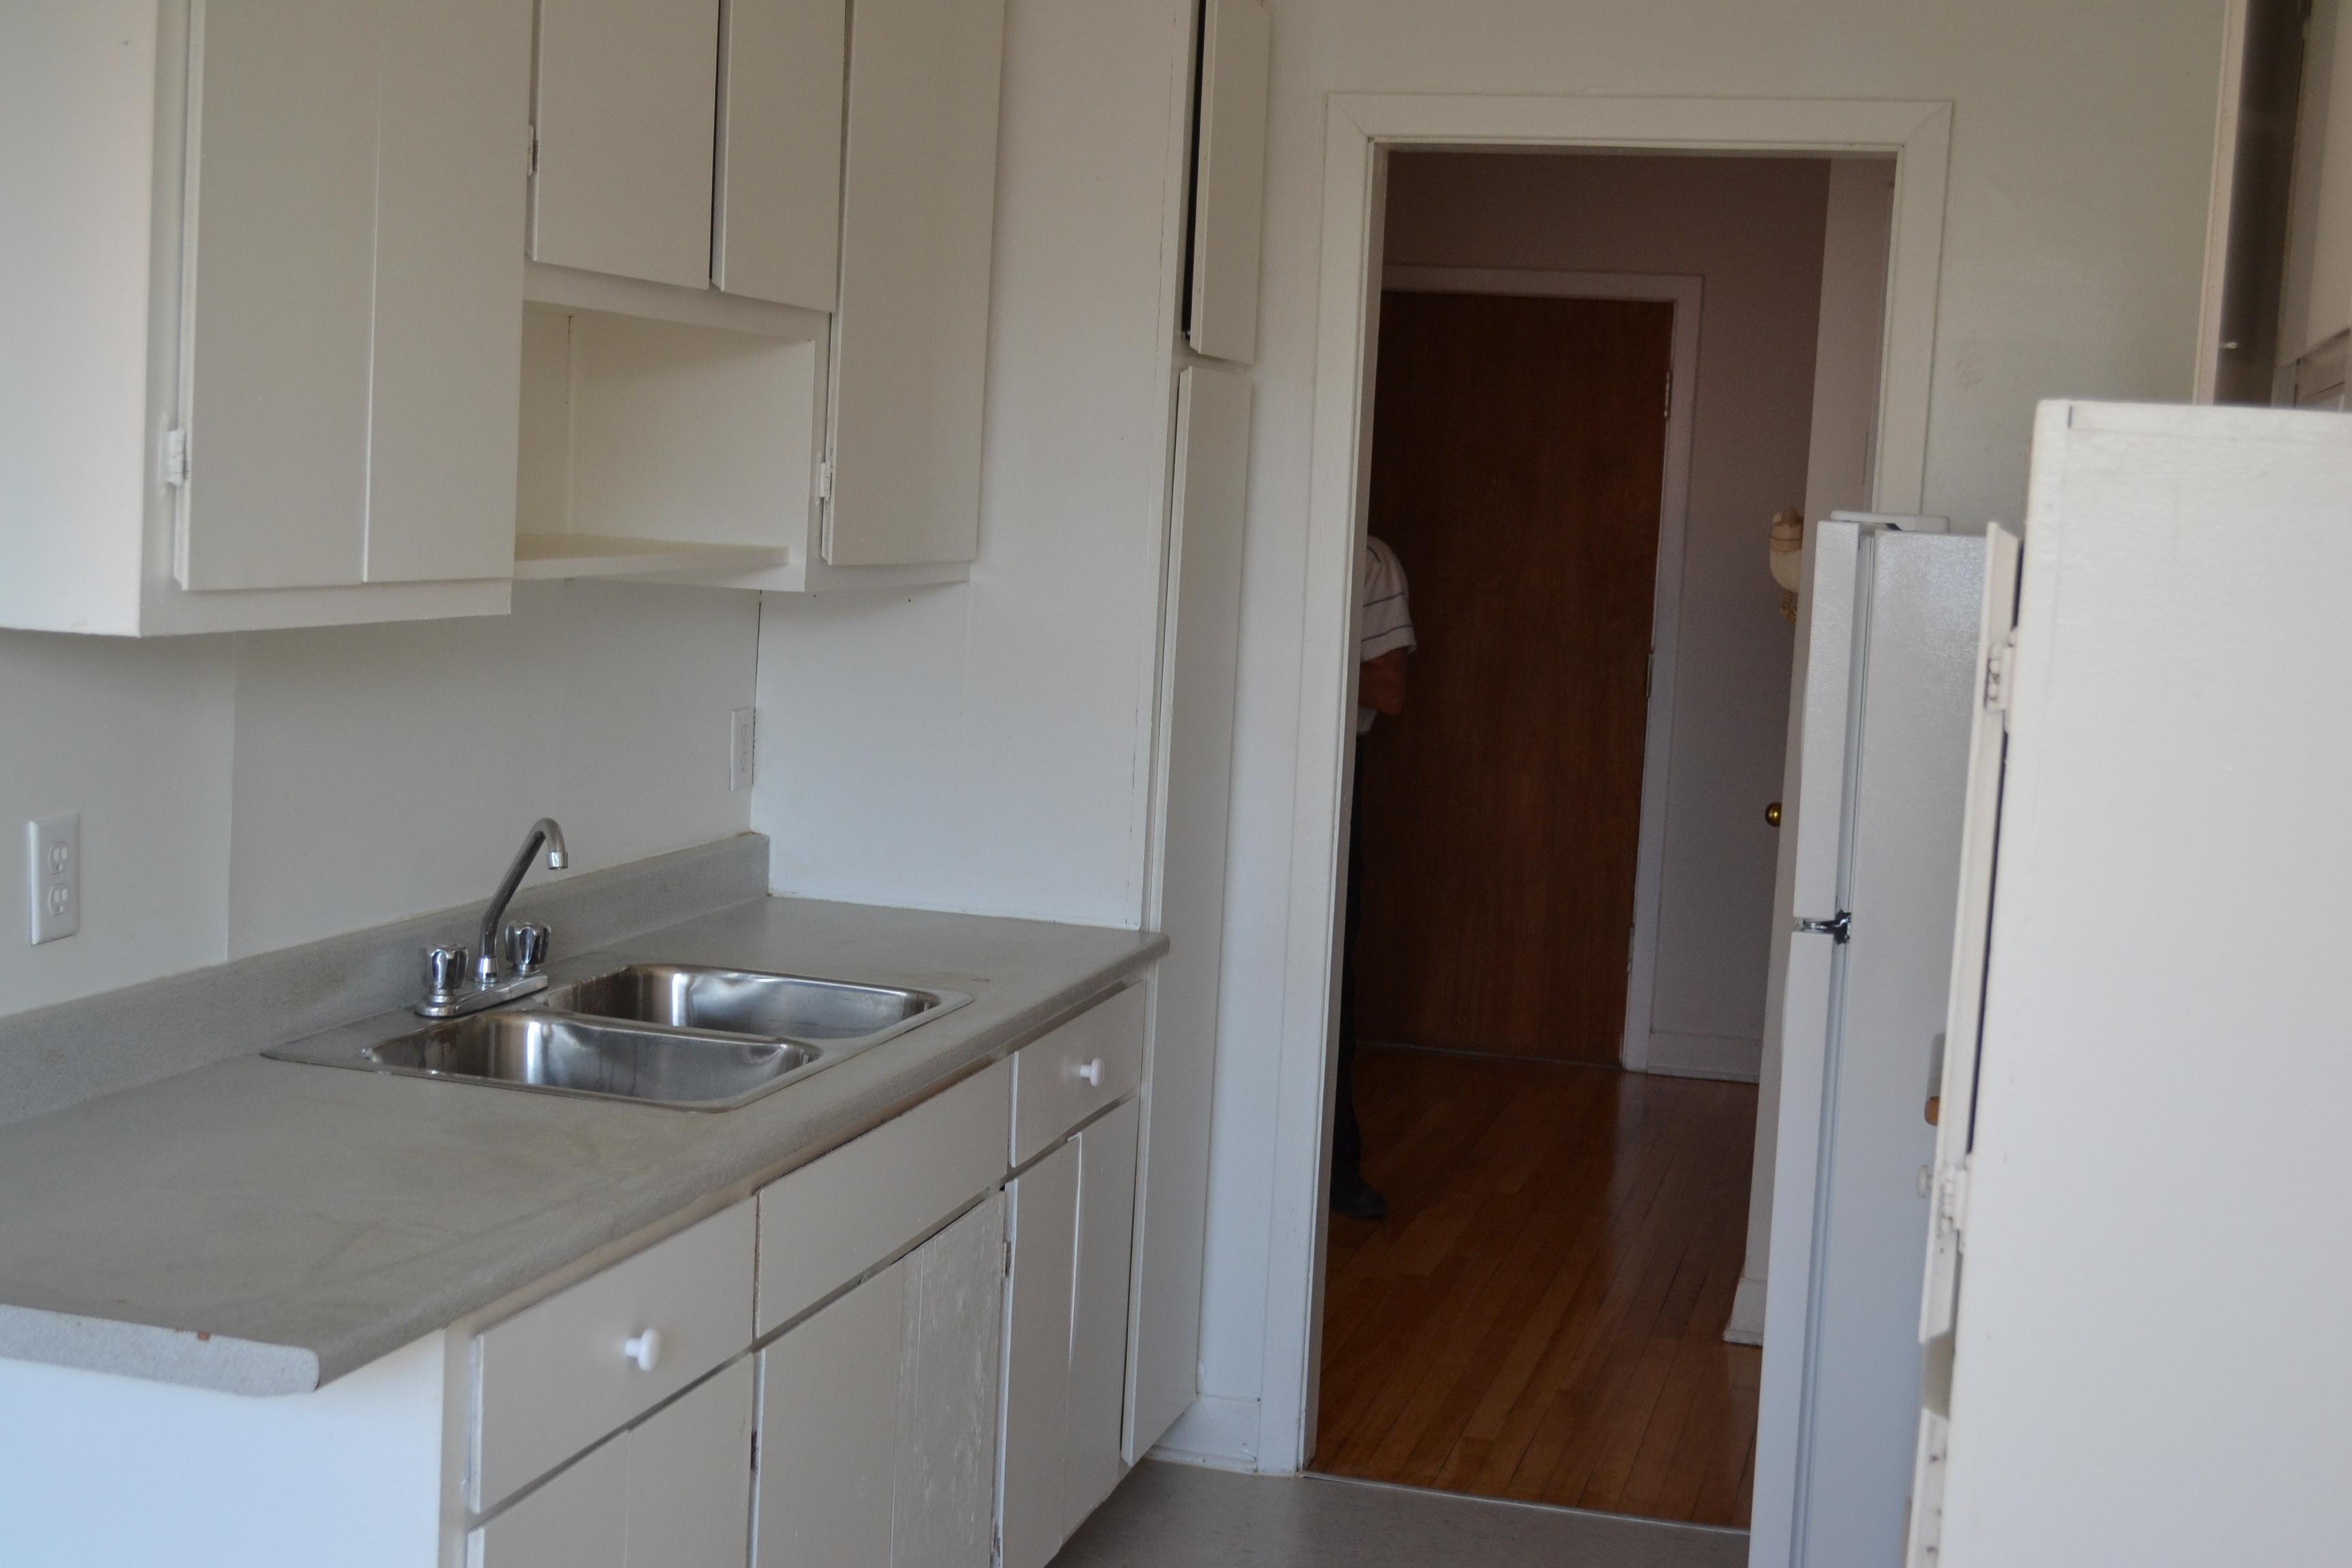 1 bedroom Apartments for rent in Cote-des-Neiges at 2615-2625 Kent - Photo 04 - RentQuebecApartments – L20719